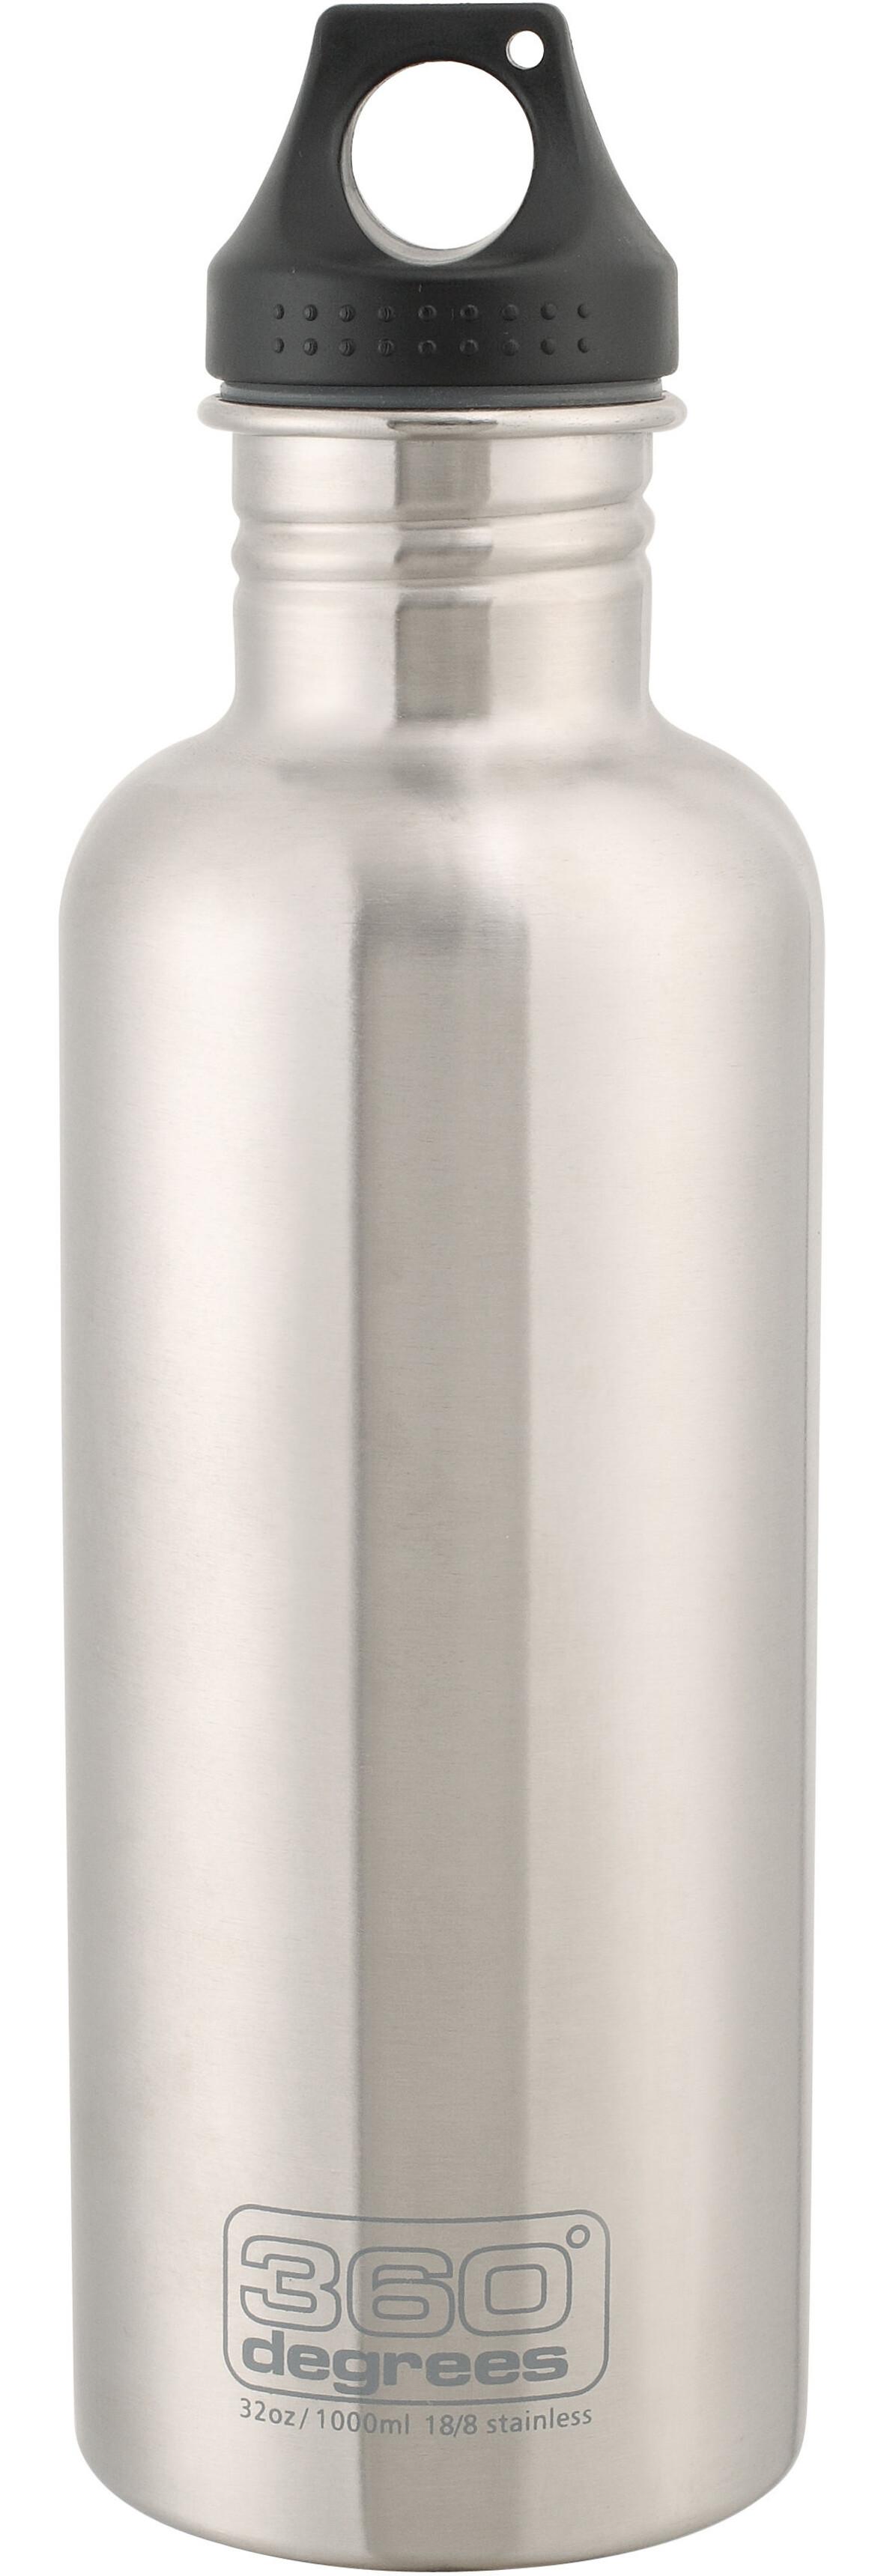 360 degrees stainless drink bottle 1000ml steel. Black Bedroom Furniture Sets. Home Design Ideas